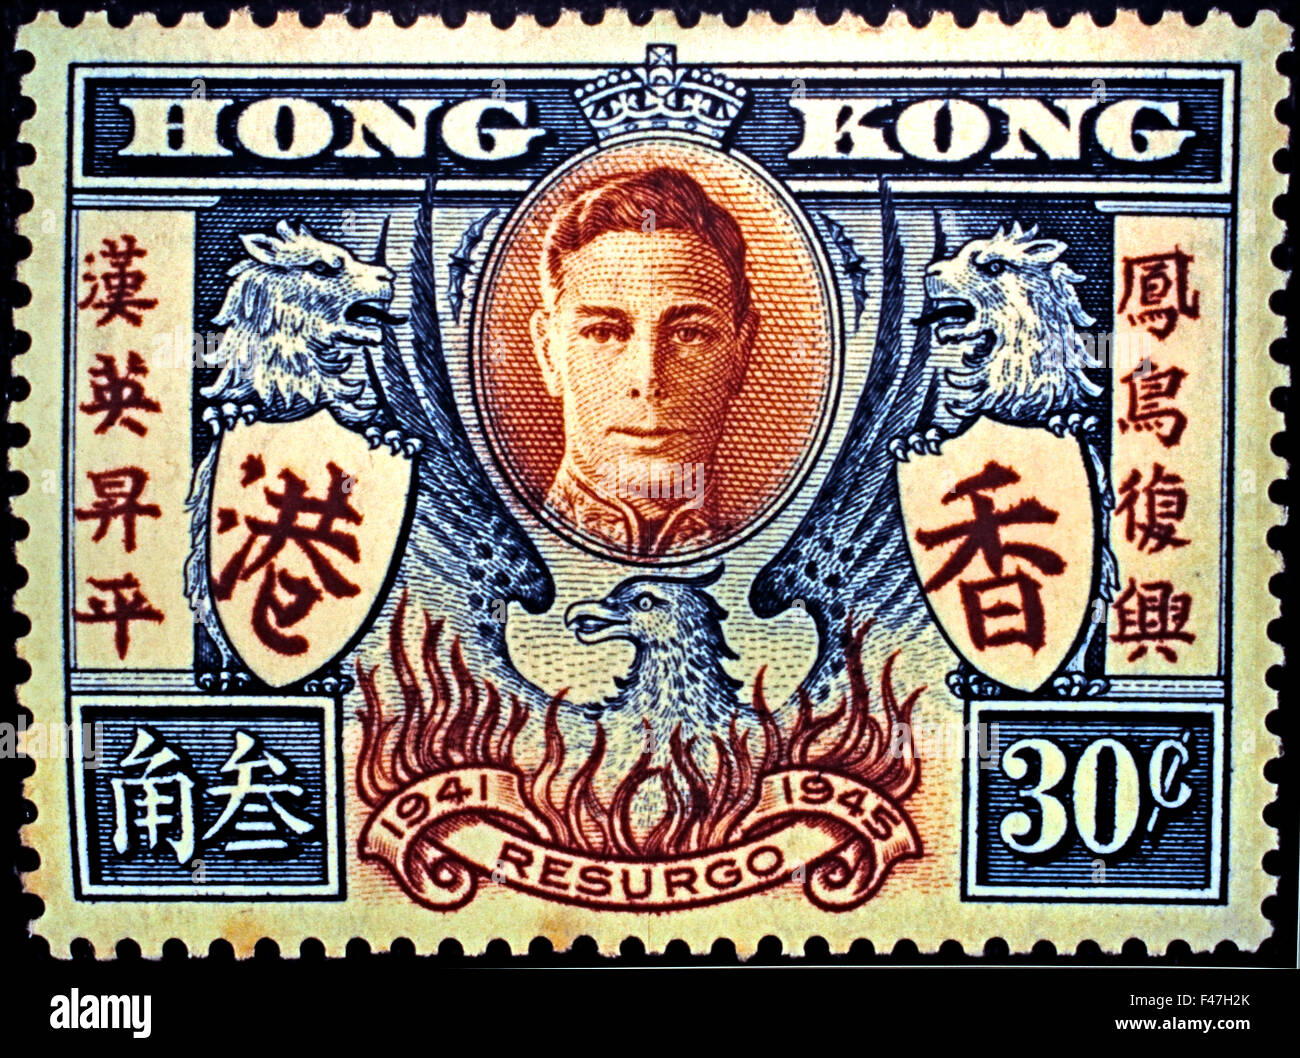 Philatelic Postage Stamp Museum of History, Hong Kong Chinese China - Stock Image